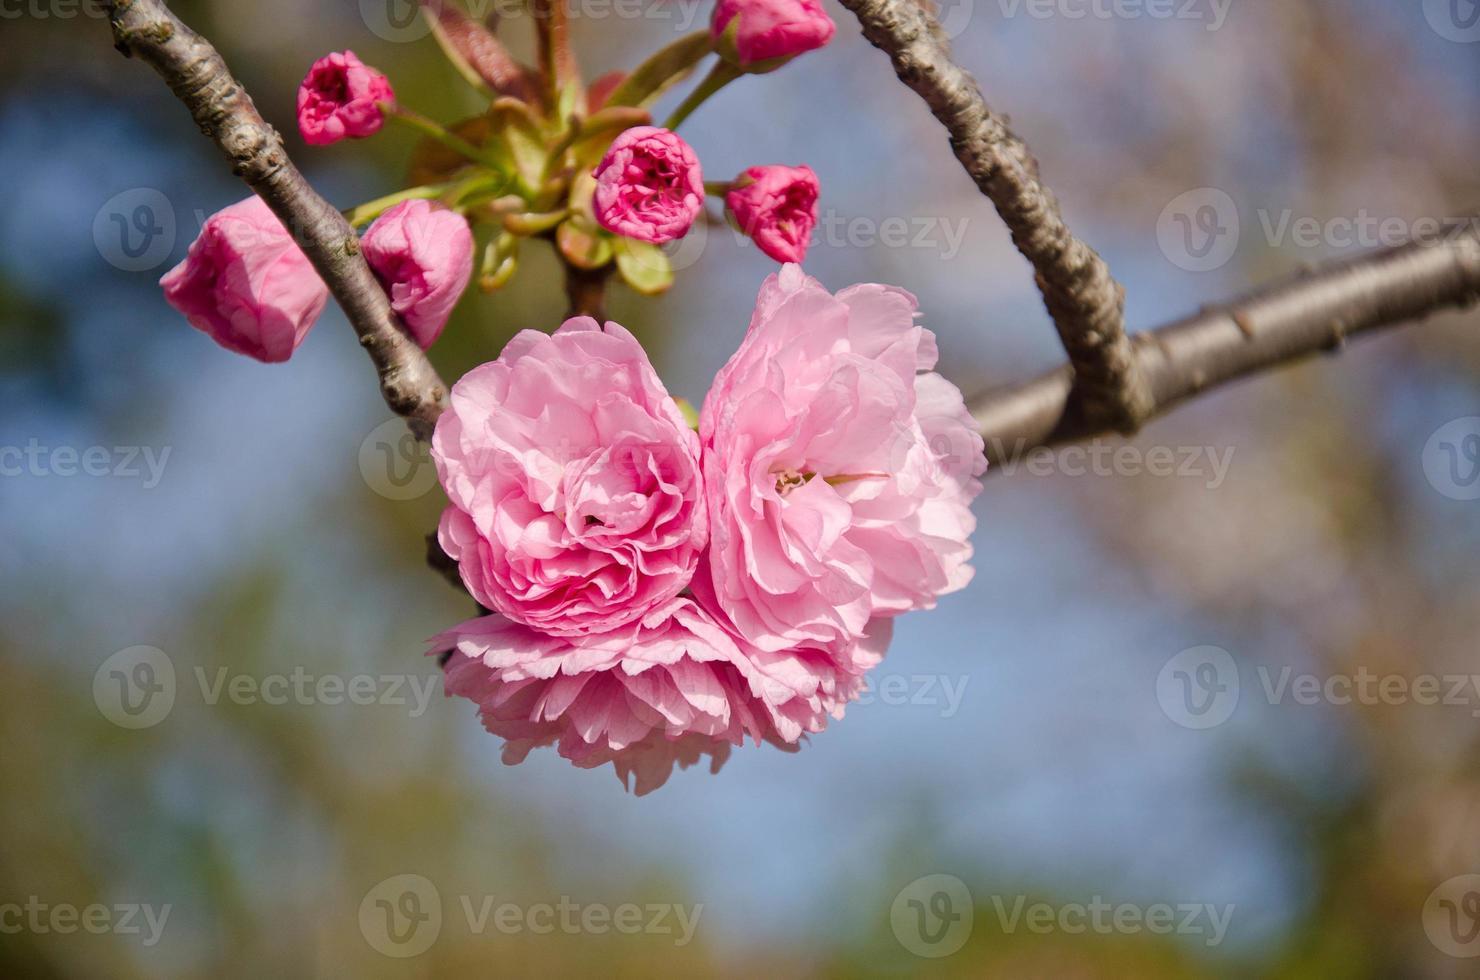 Sakura: Kirschblütenblume am Baum foto